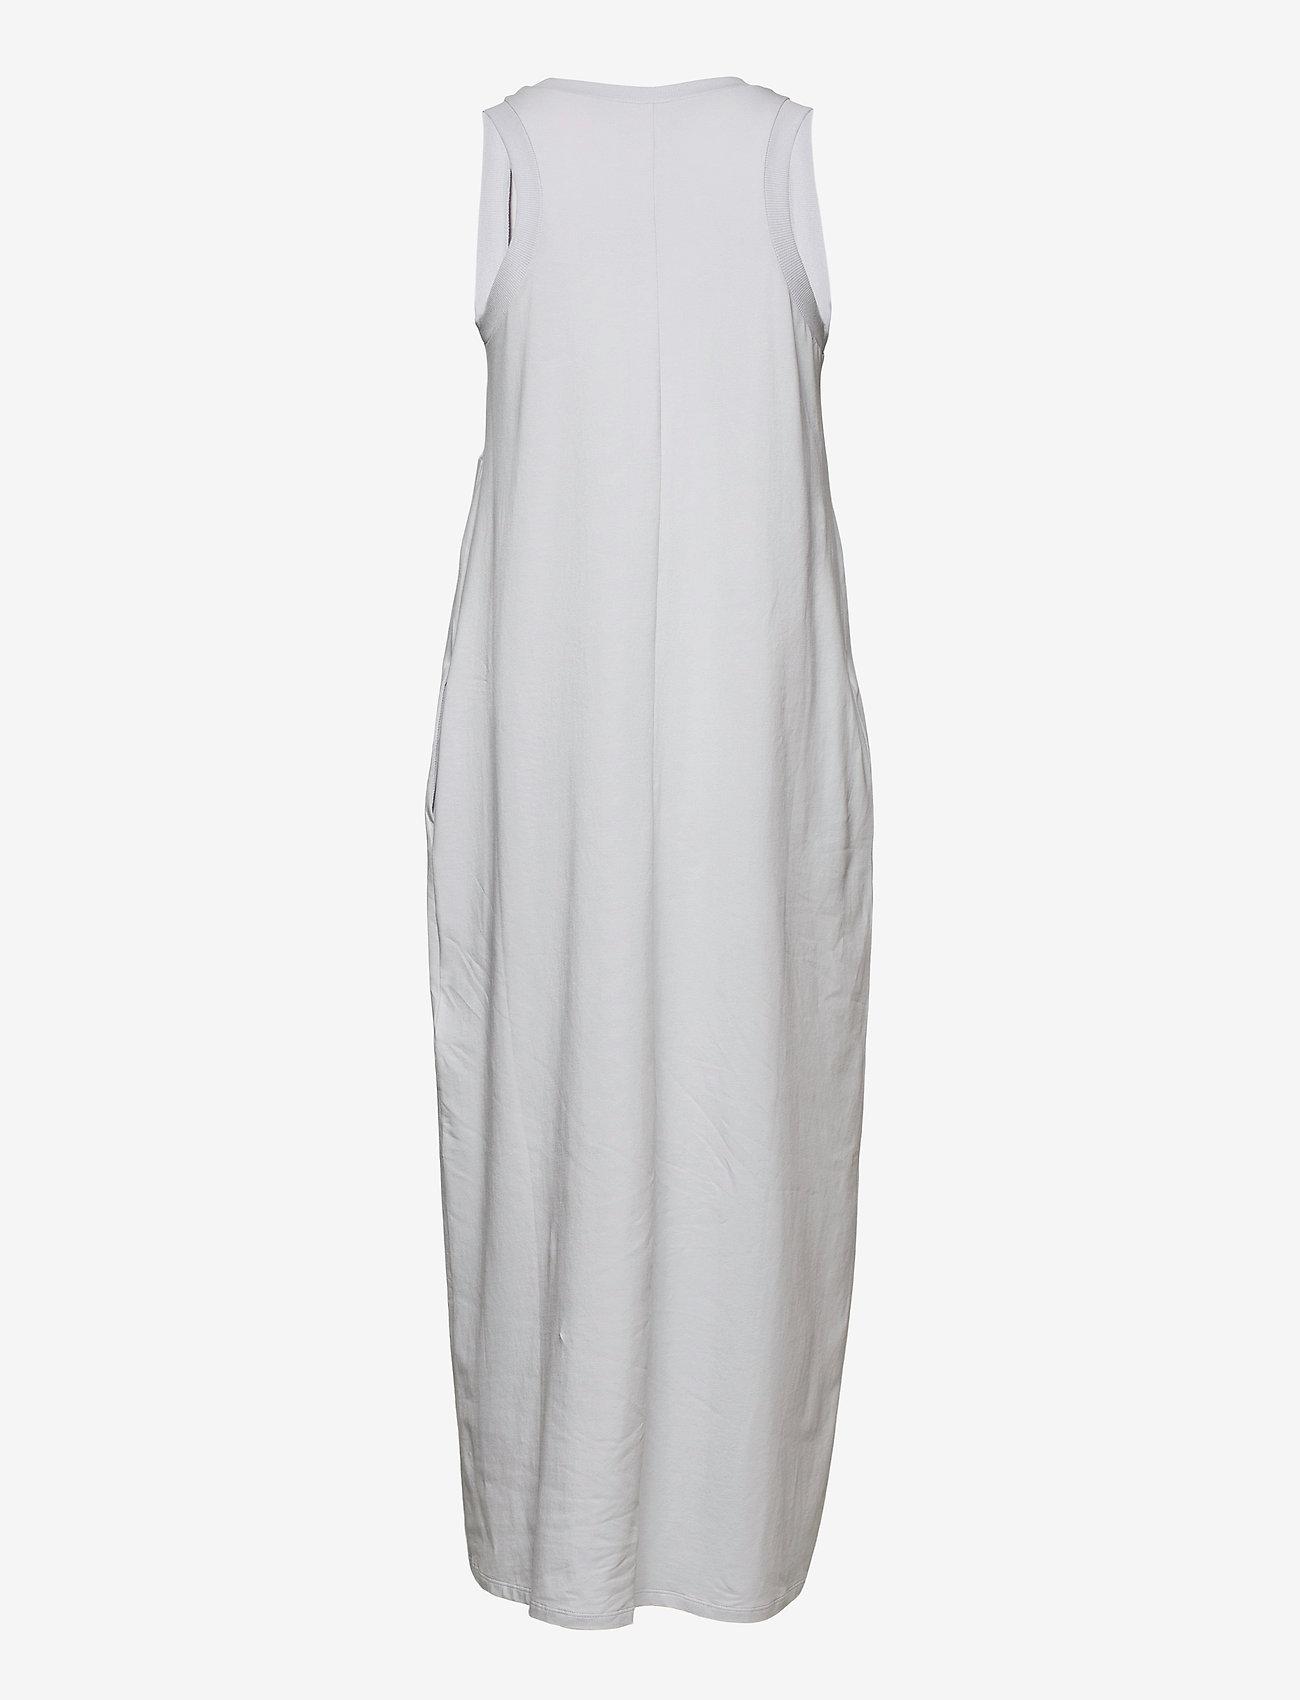 Max Mara Leisure - BAGAGLI - maxi dresses - light grey - 1